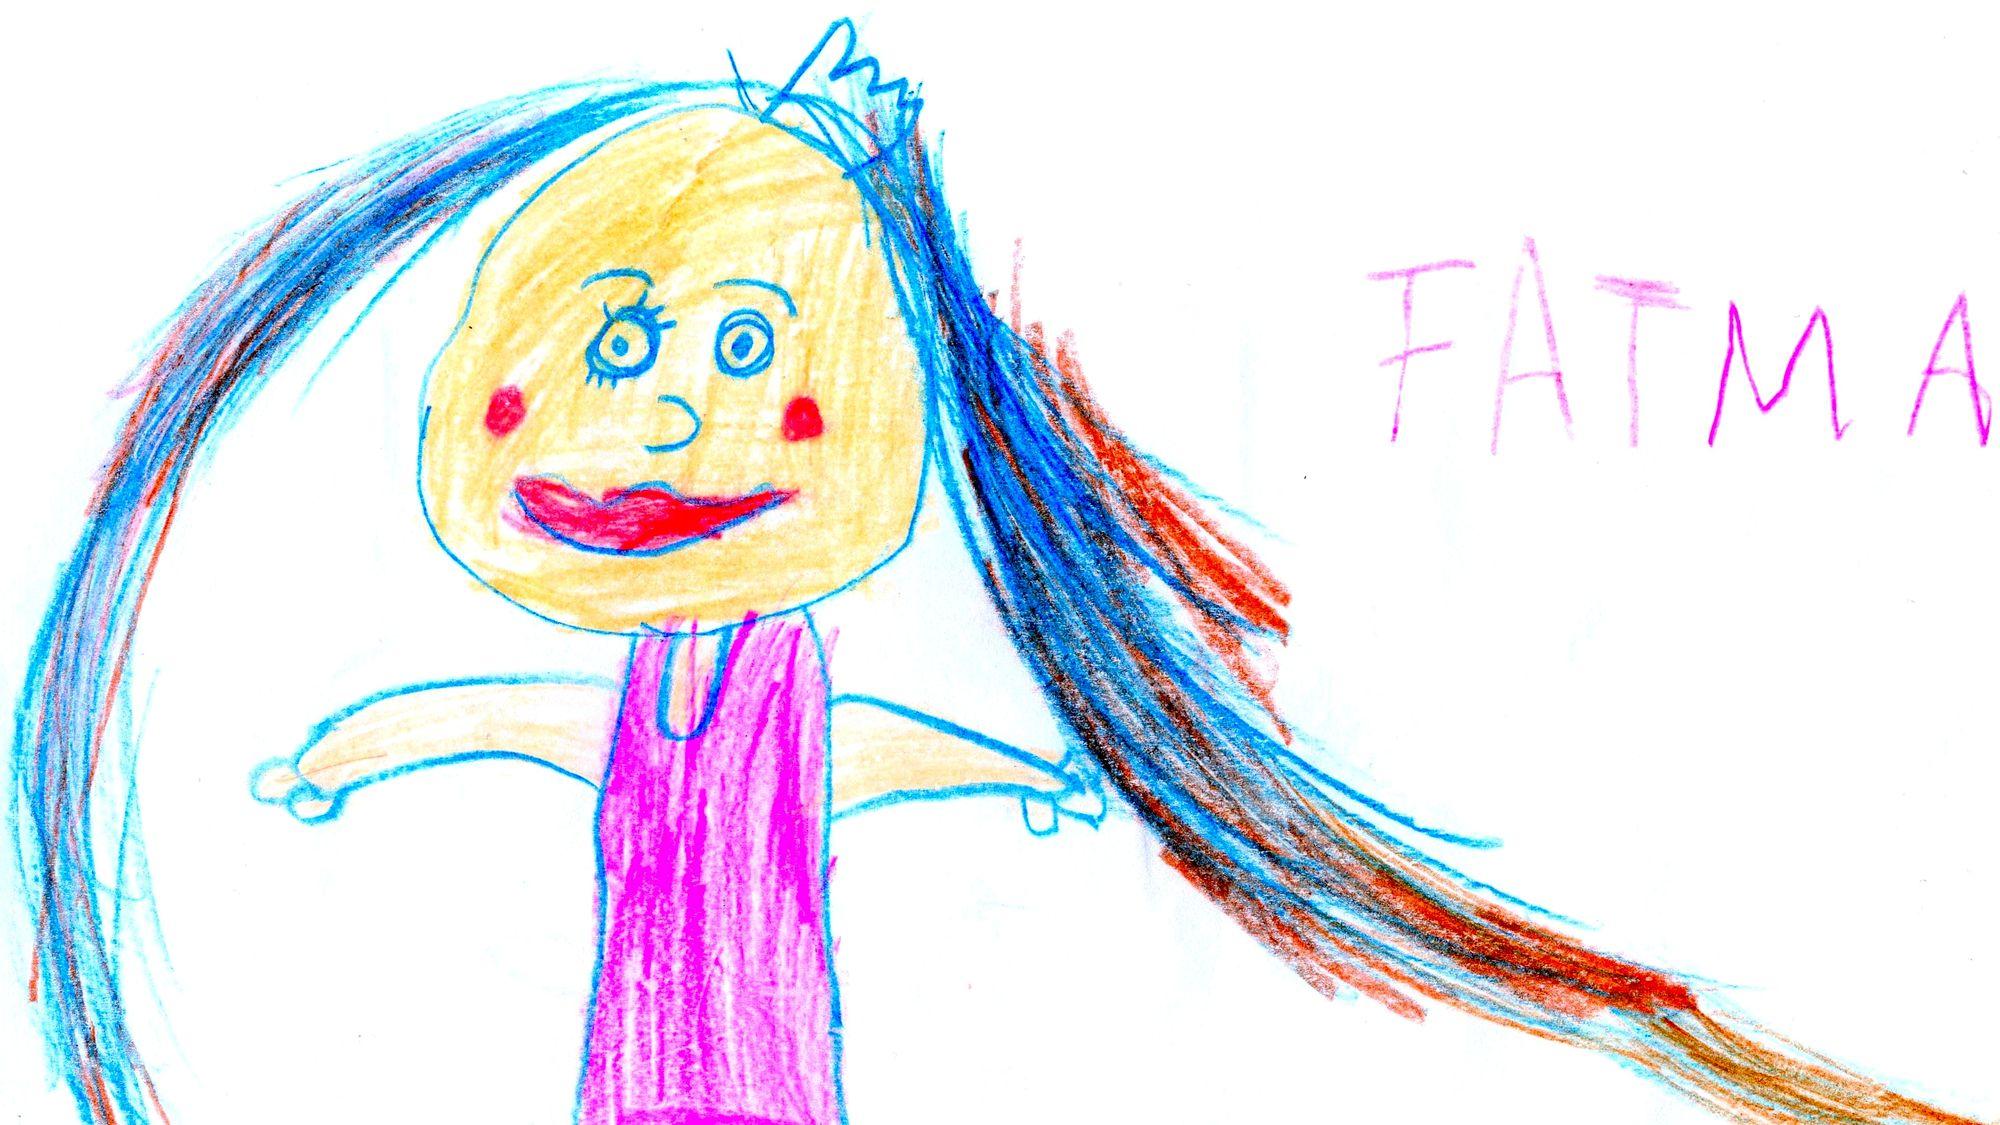 Prinzessin Fatma